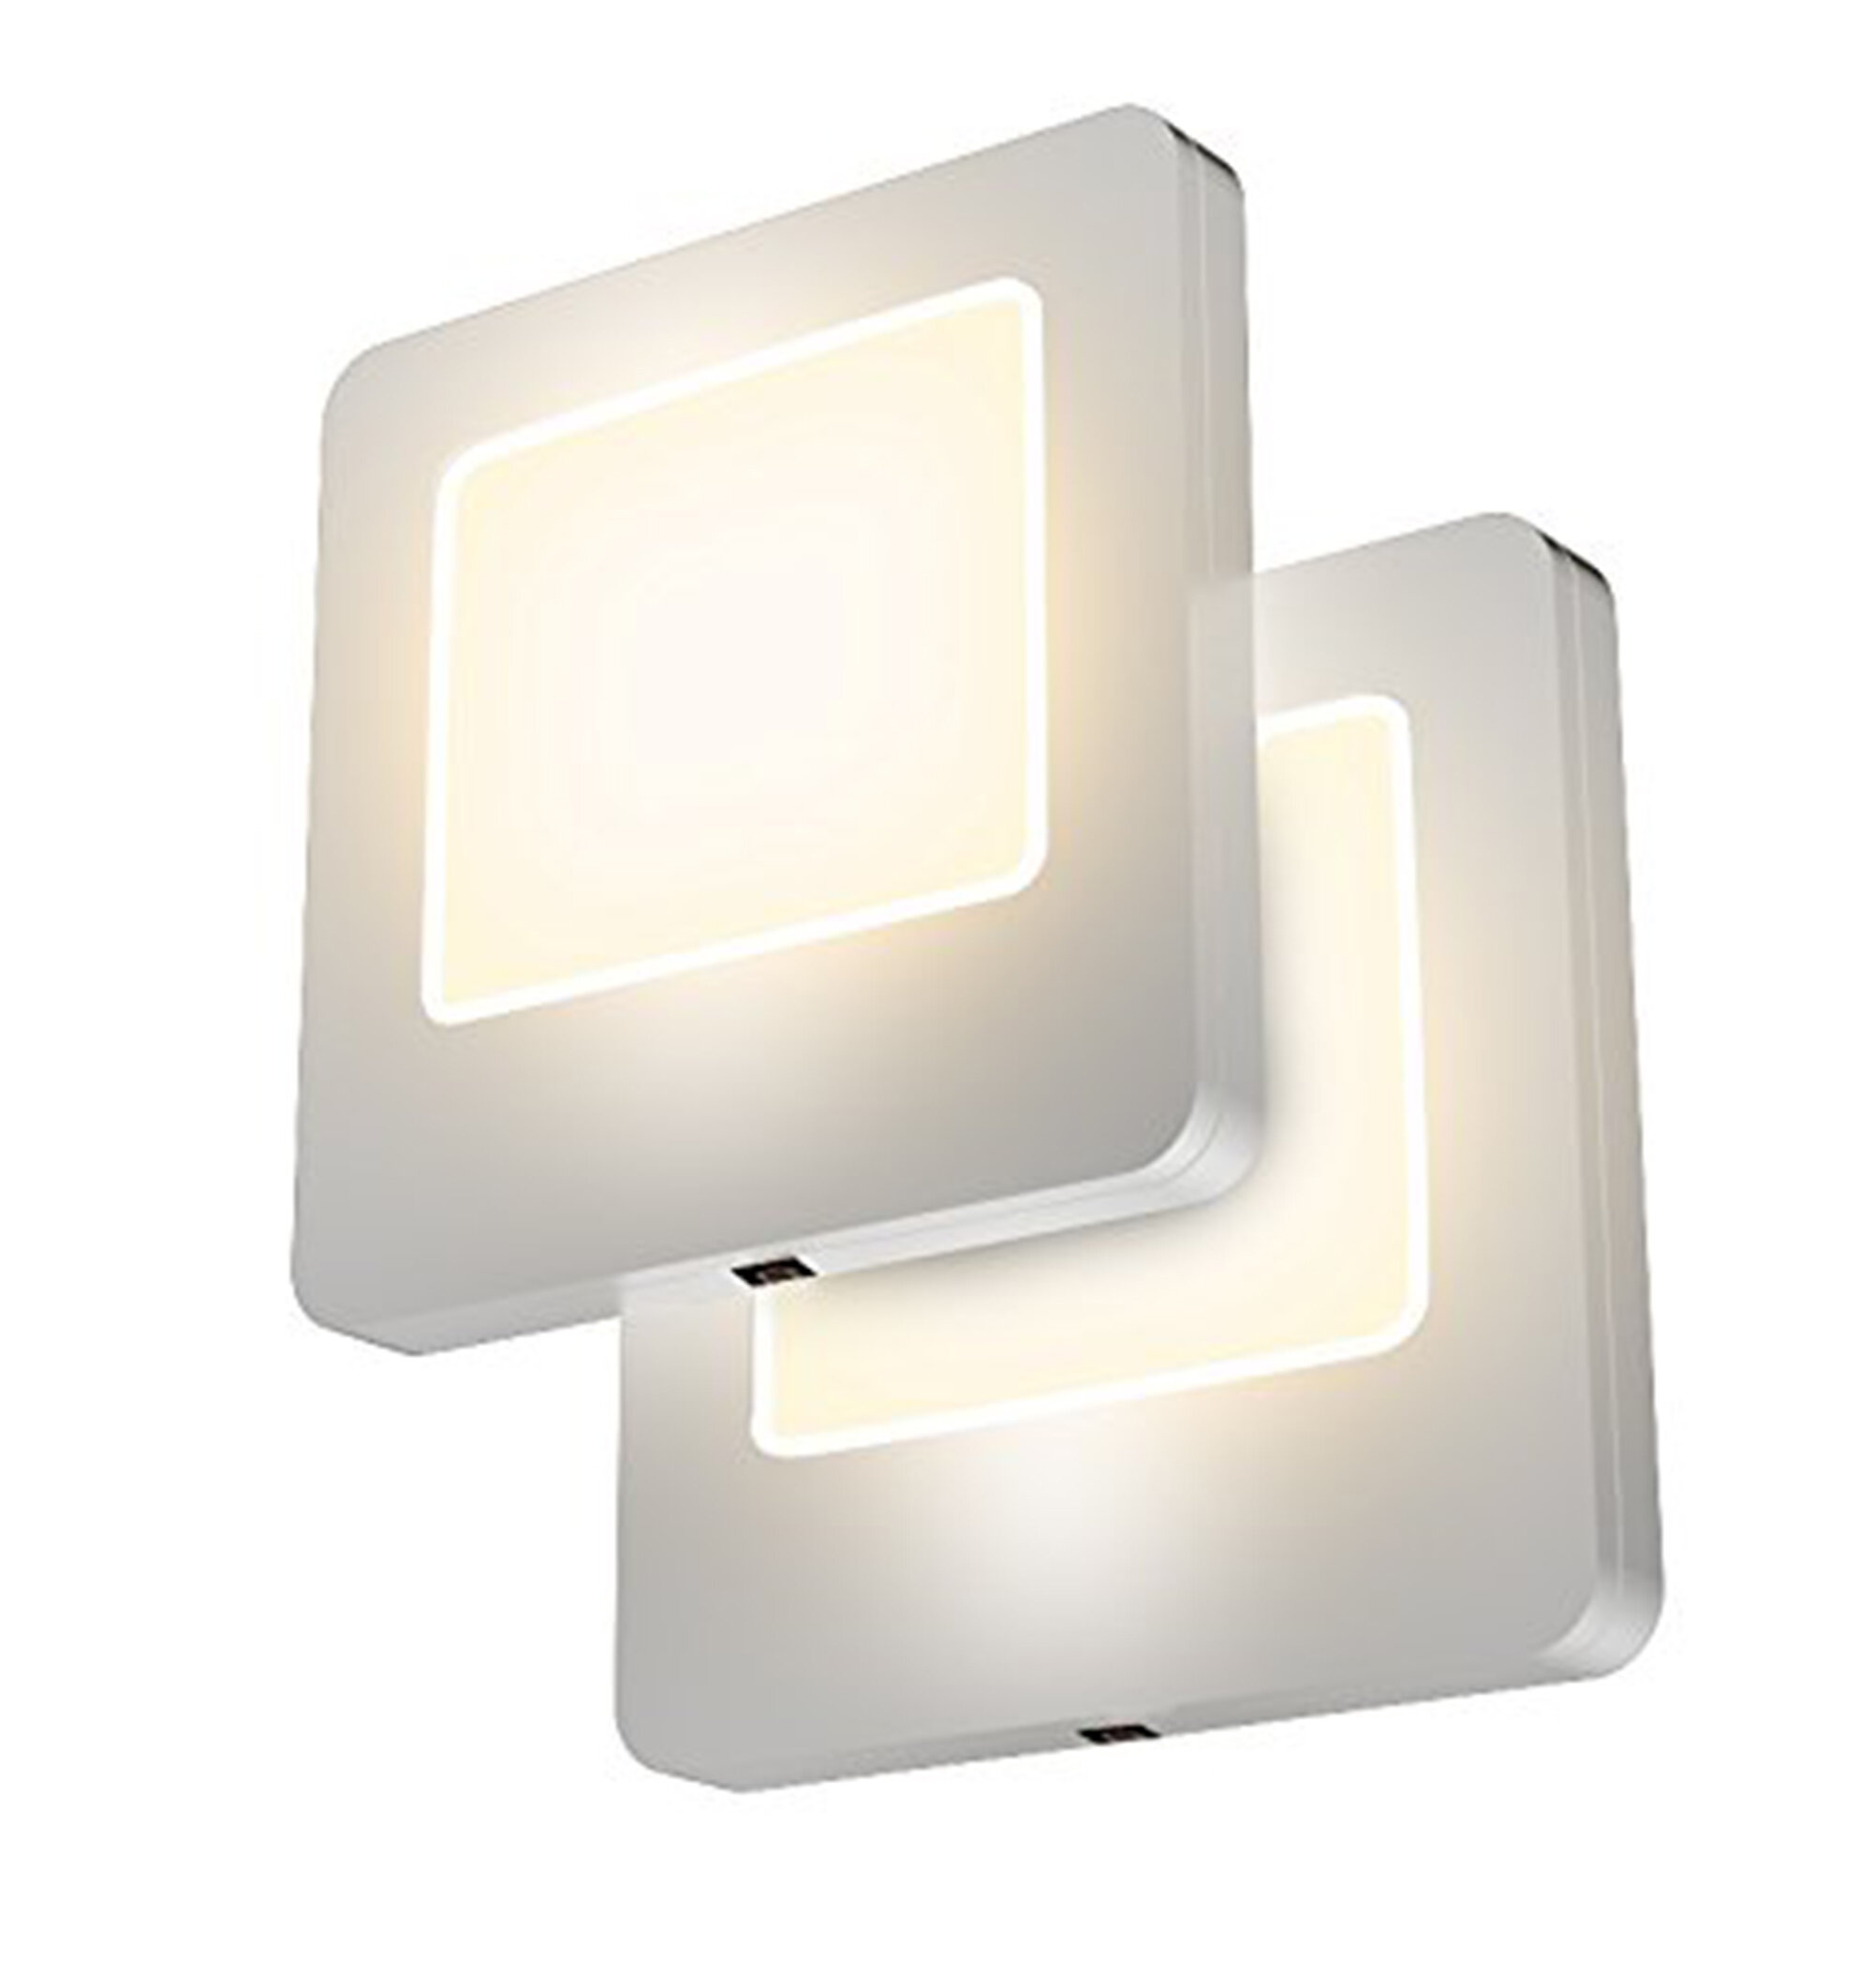 LED Night Light Plug-in Lamp with Dusk to Dawn Sensor for Hallway Kids Bedroom